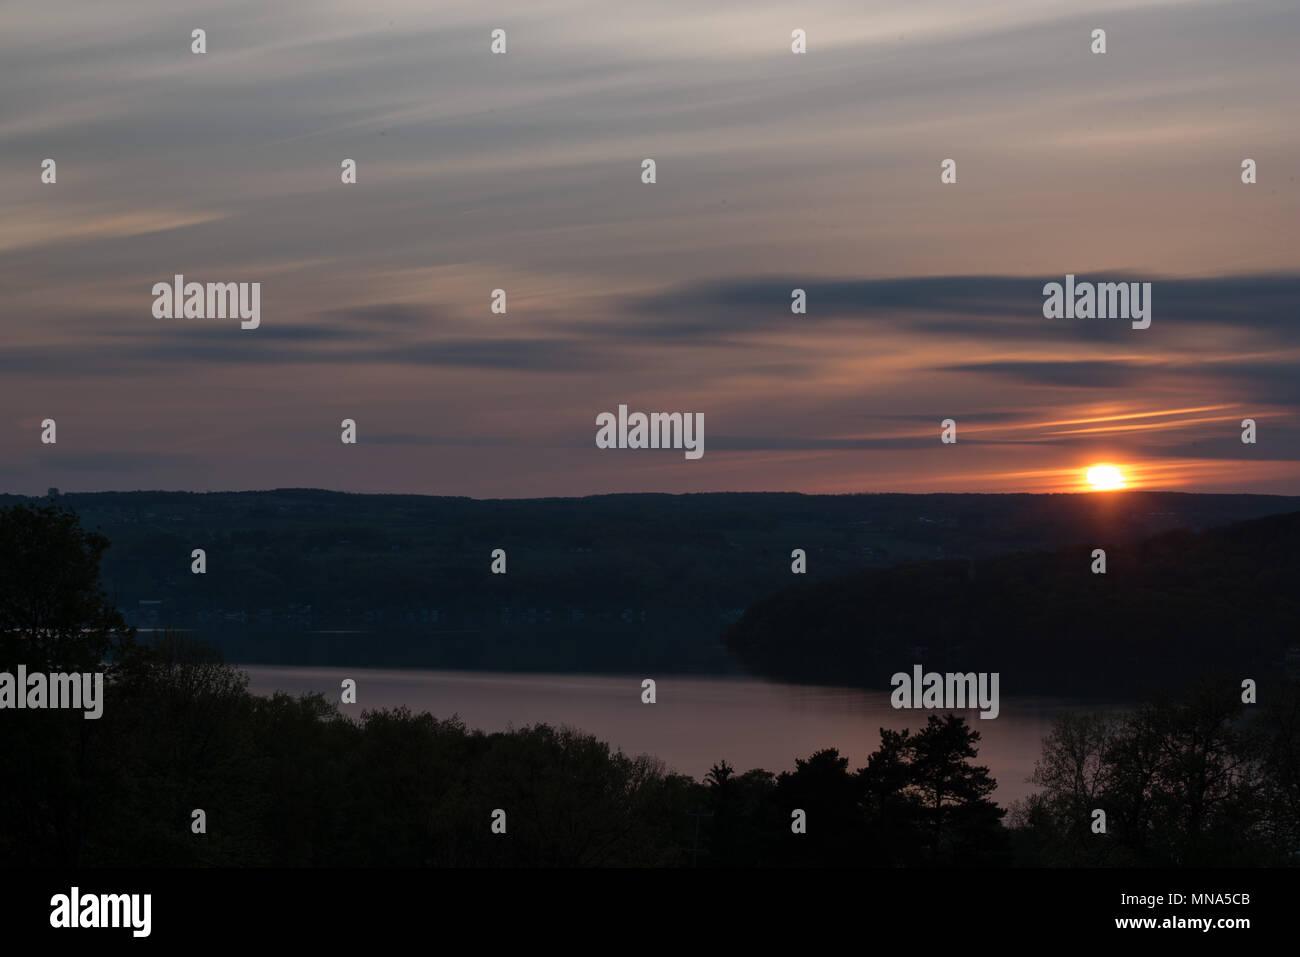 Sunset Over Bluff on Keuka Lake - Stock Image